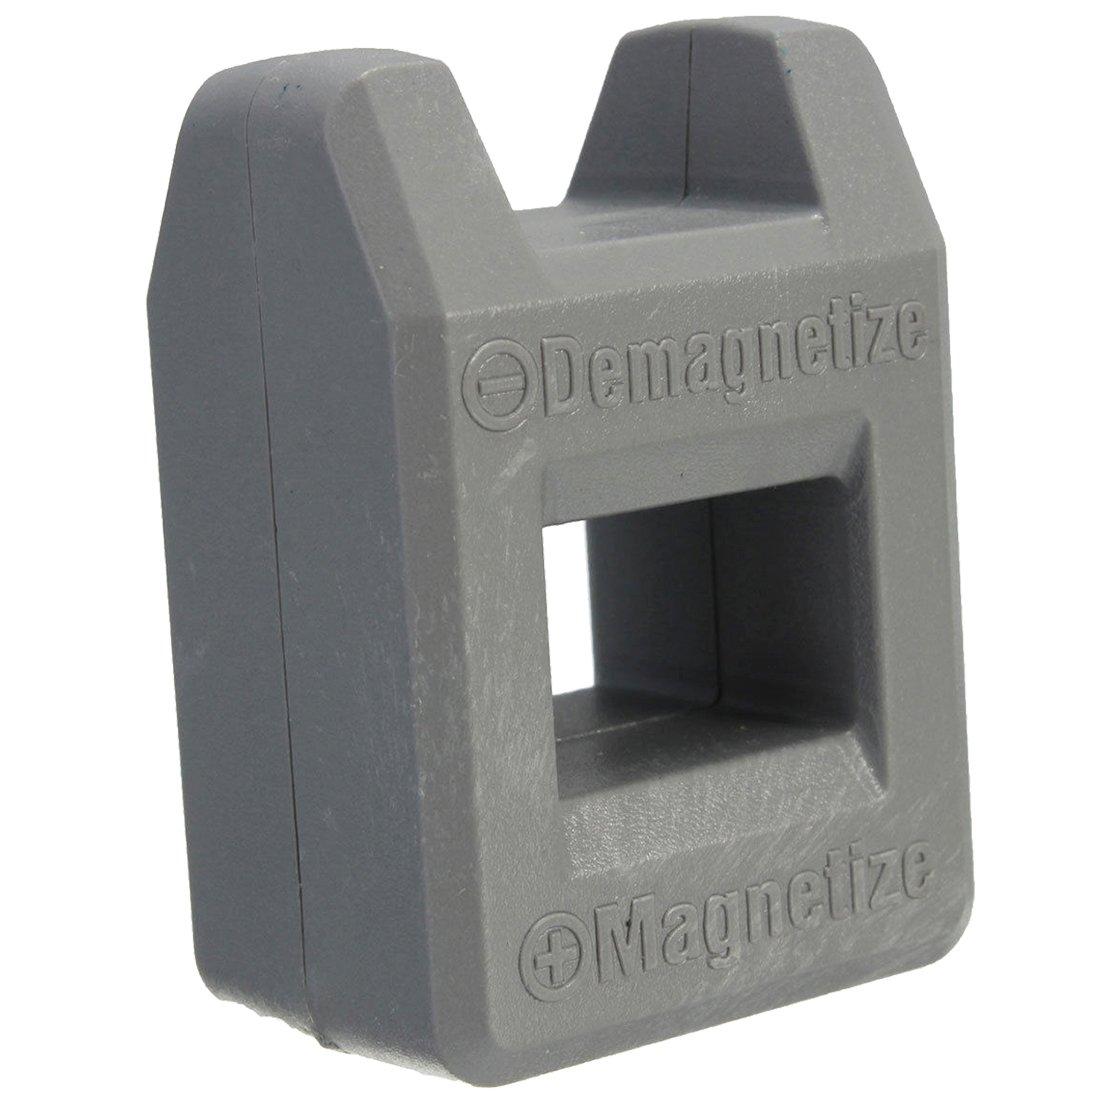 SODIAL(R) Screwdriver Magnetizer Degaussing Demagnetizer Magnetic Practical Pick Up Tool Color:Gray